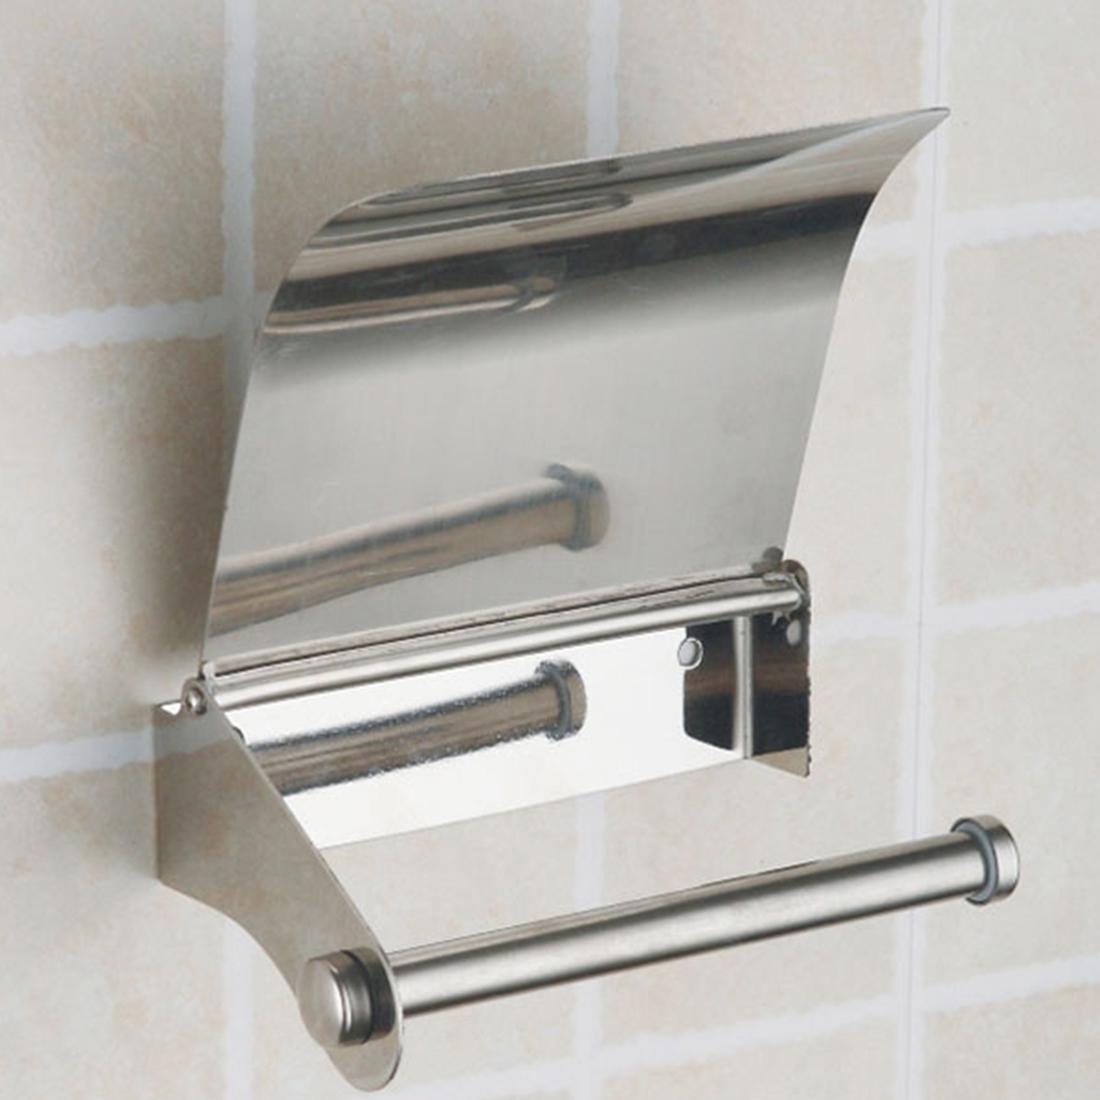 Bathroom Accessories Stainless Steel Toilet Paper Roll Holder Creative Bathroom Wall Mount Rack Toilet Paper Holder